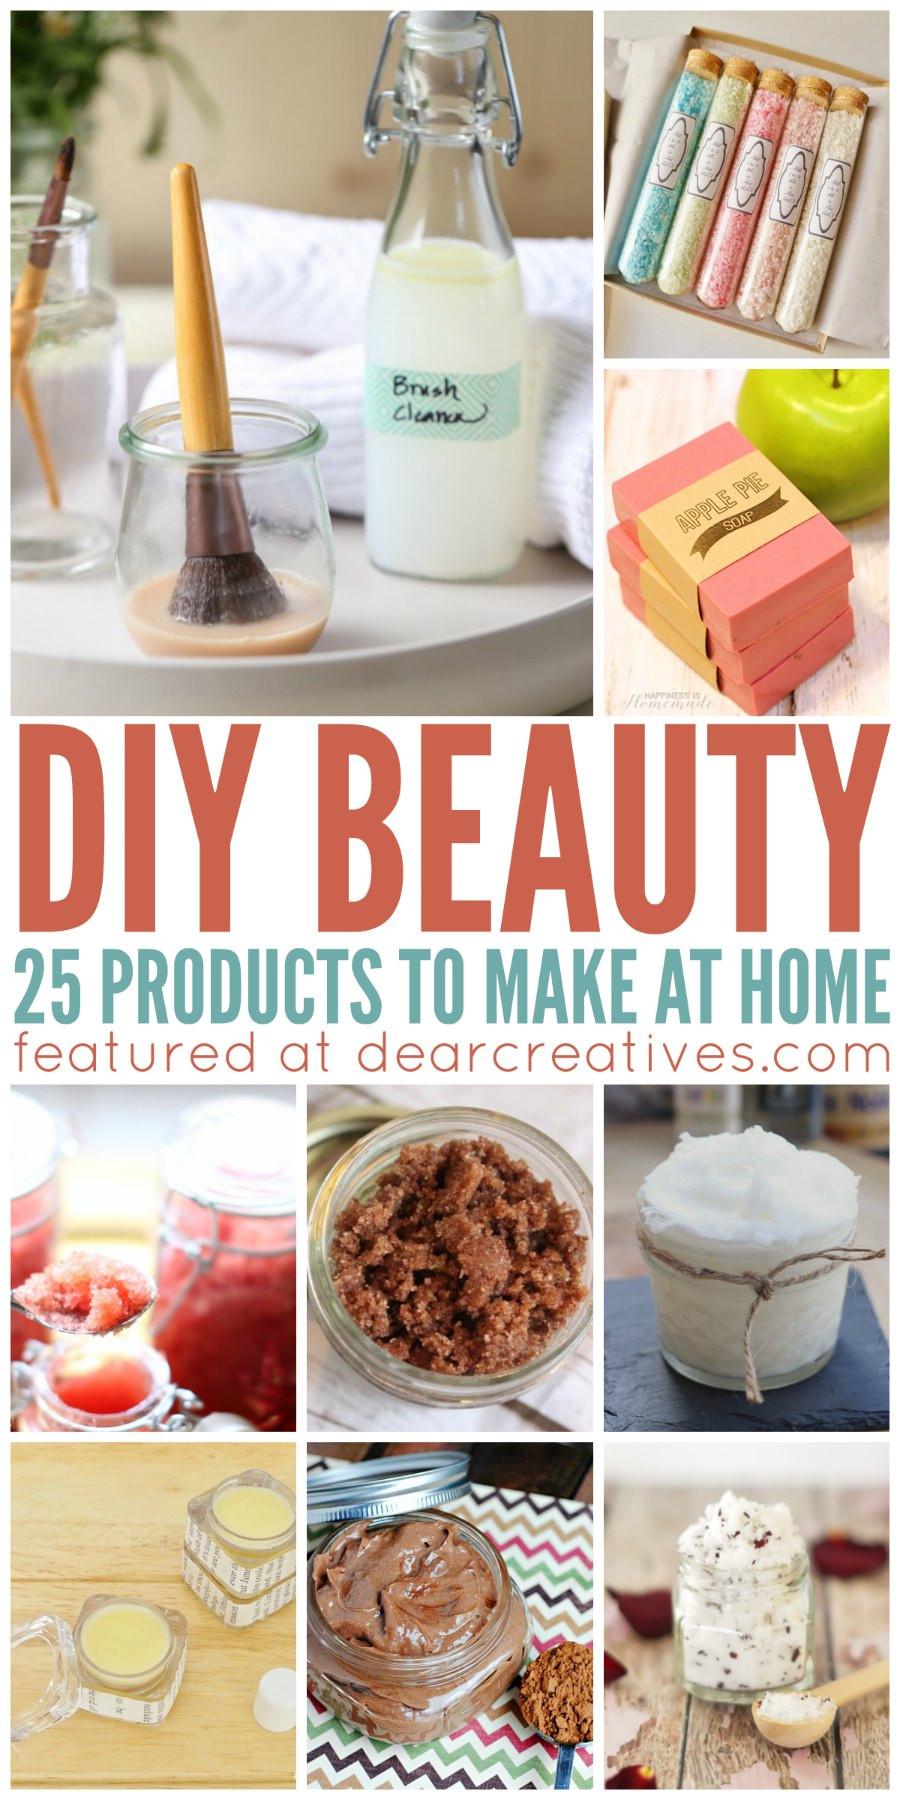 Diy Beauty  DIY Beauty 25 Must Try Homemade DIY Beauty Products